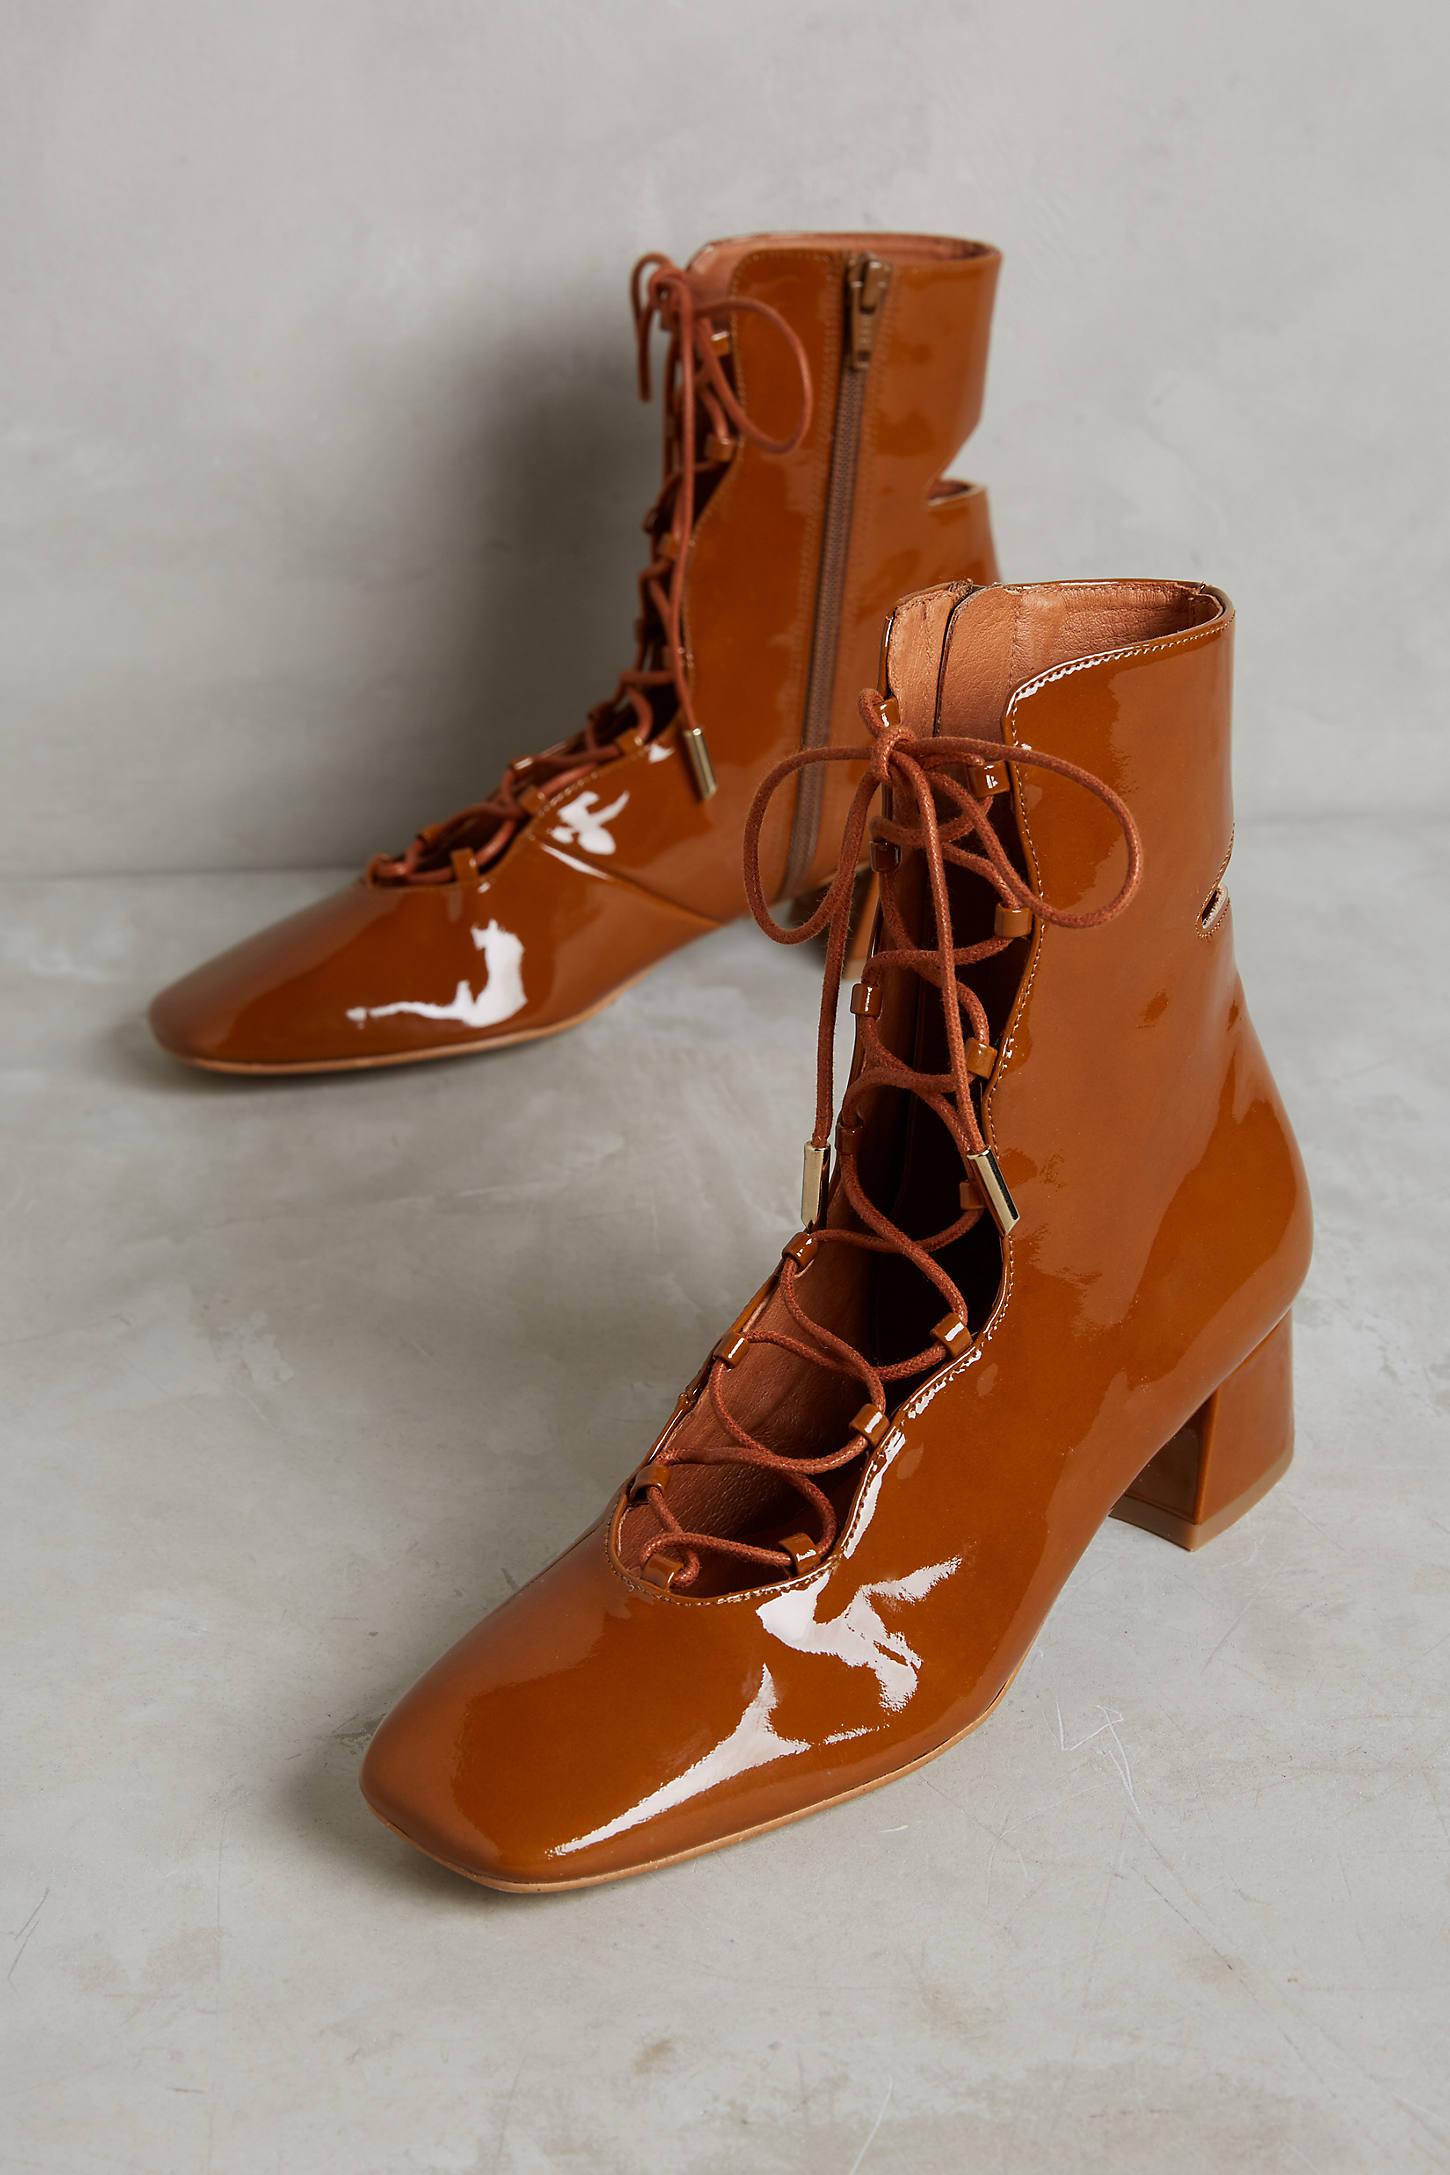 Miista Analeigh Boots